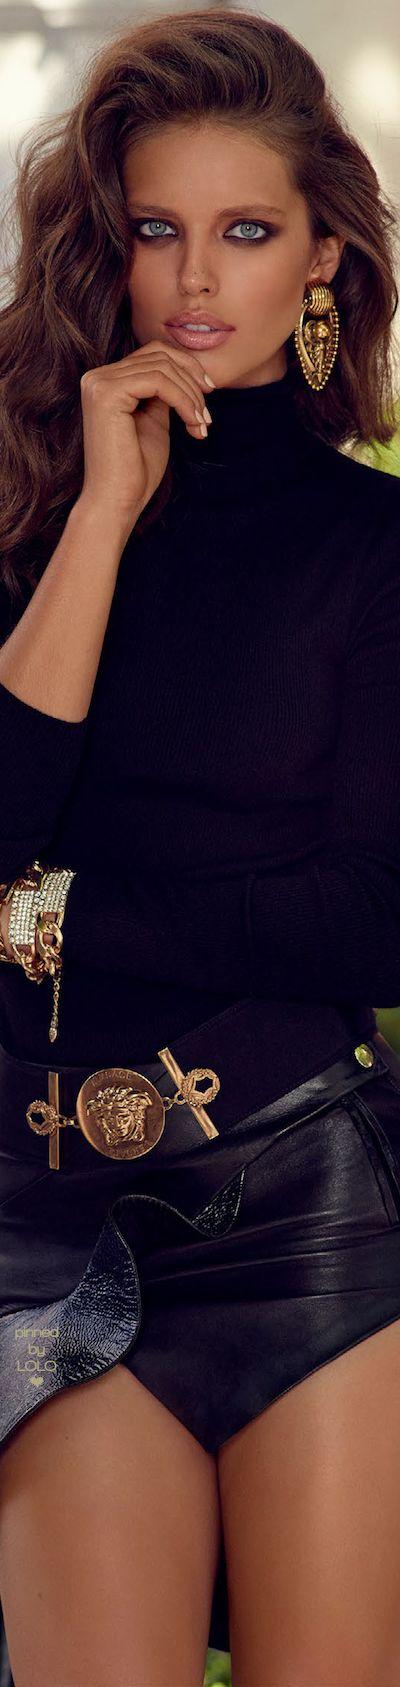 Emily DiDonato Vogue Spain October 2014 | LOLO❤︎